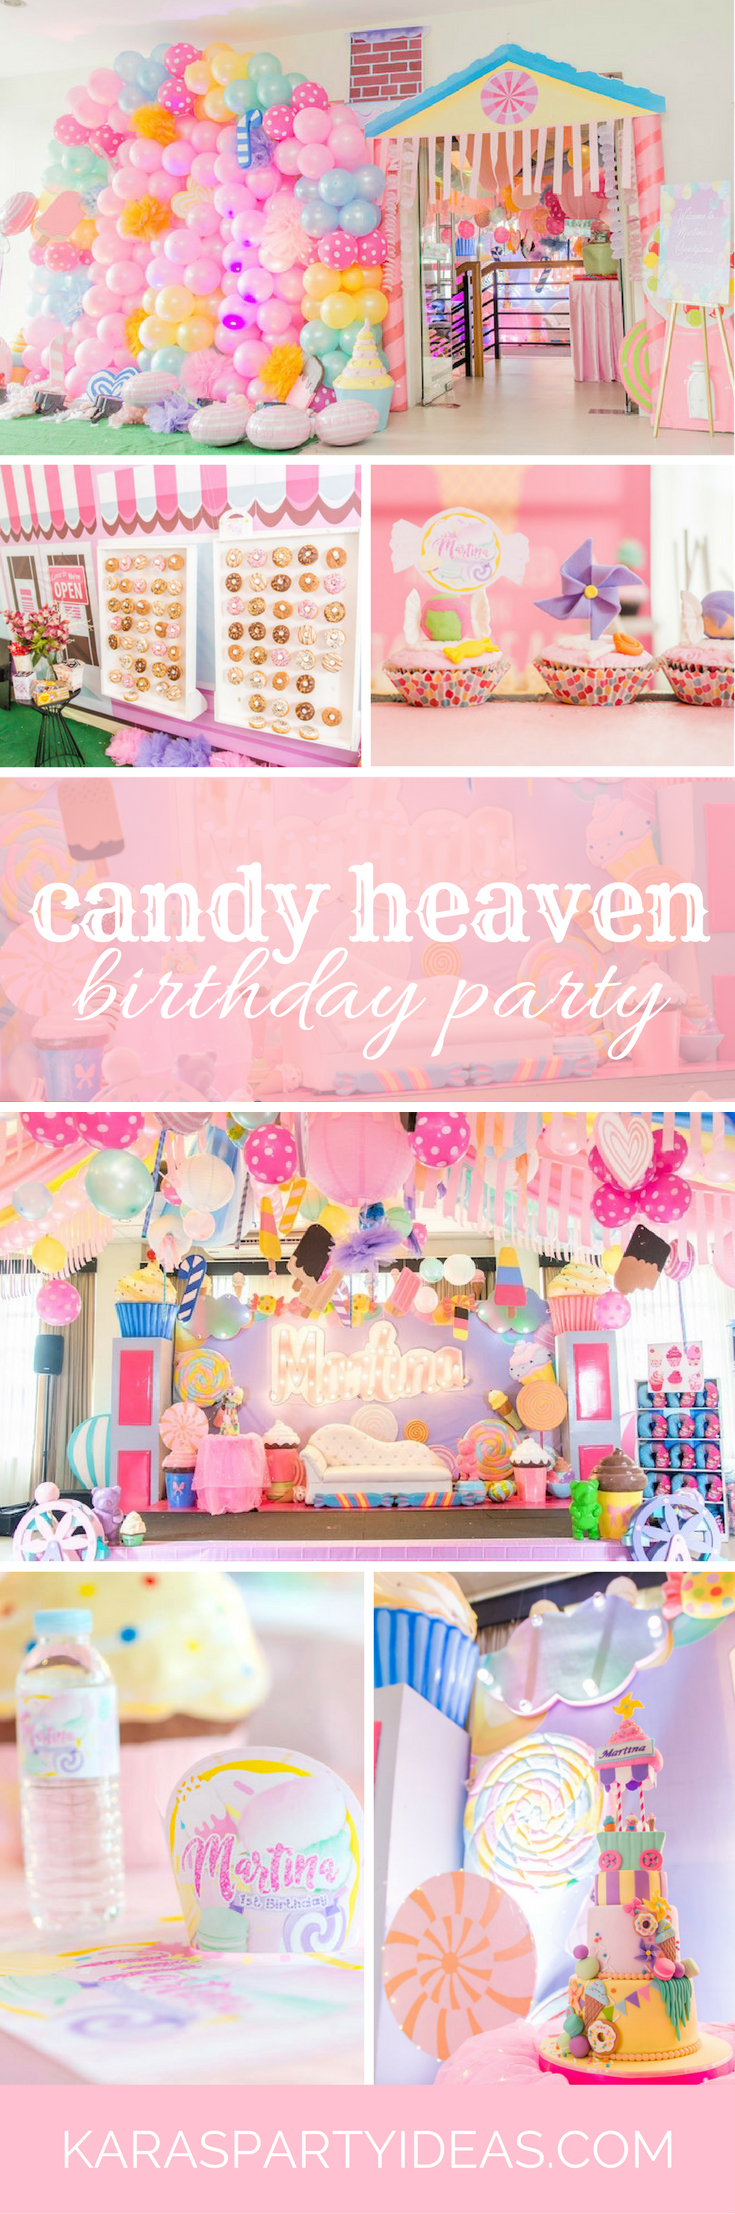 Tea time tea birthday party via kara s party ideas karaspartyideas com - Candy Heaven Birthday Party Via Kara S Party Ideas Karaspartyideas Com